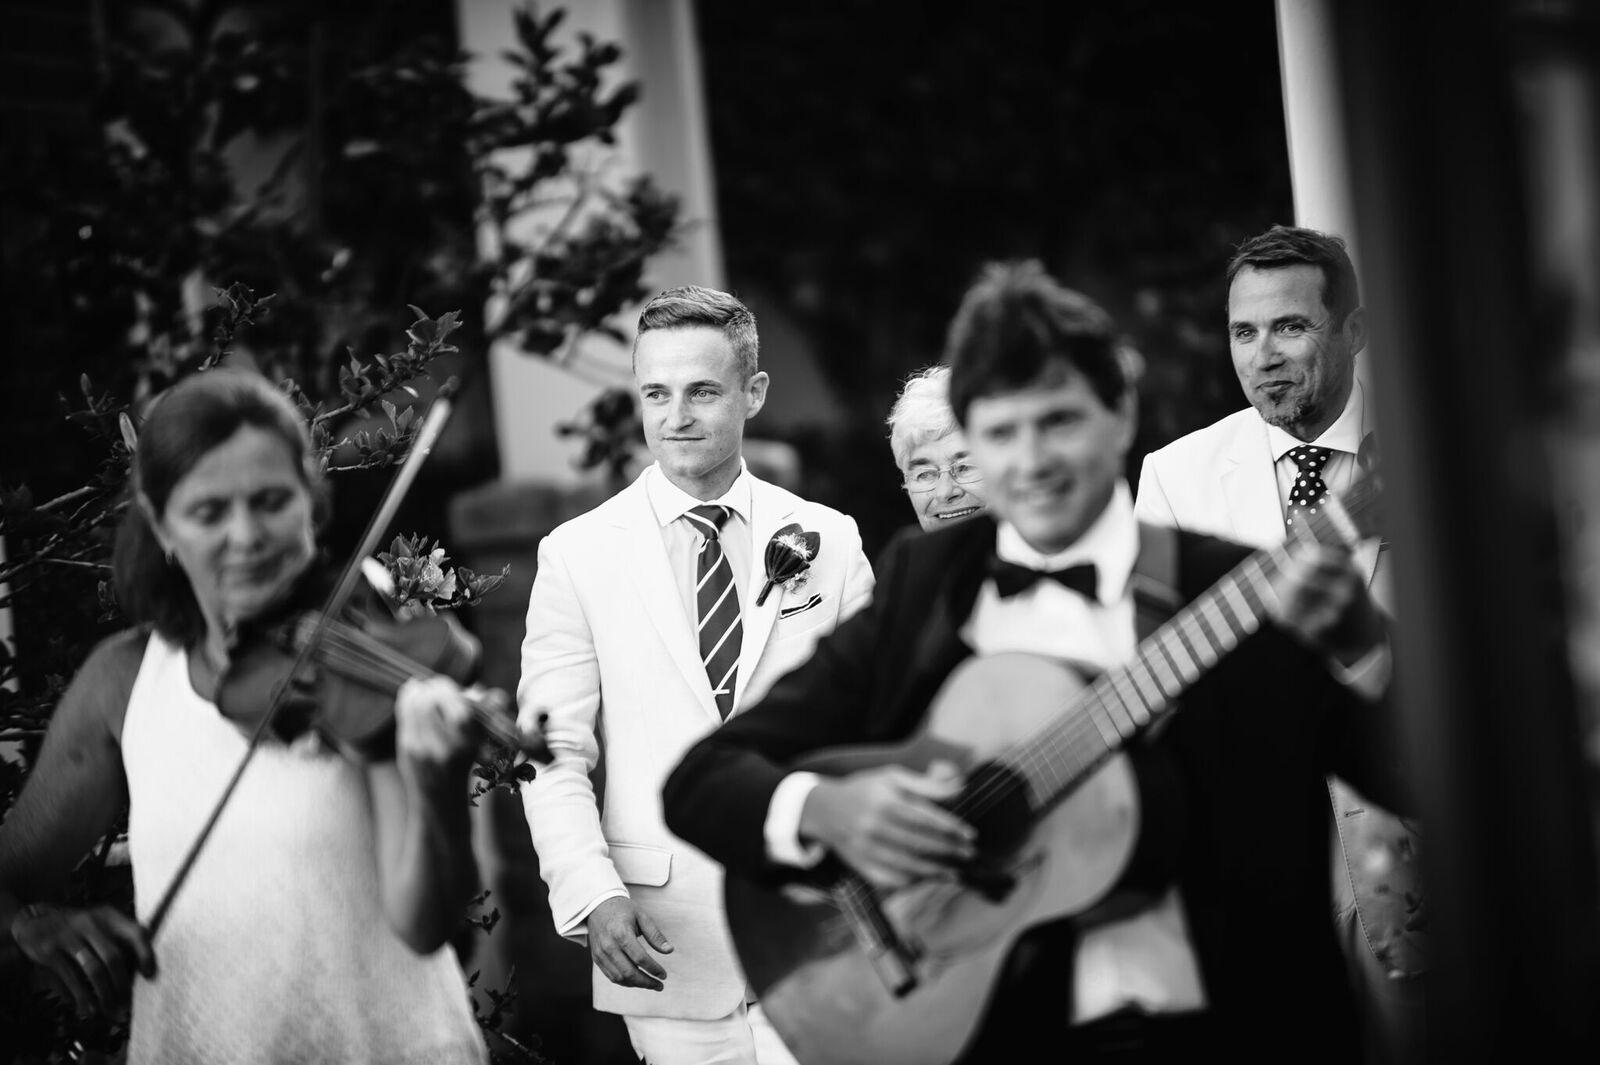 Bruce & Herve Wedding 31 Dec 2016 -   Pic 13.jpg